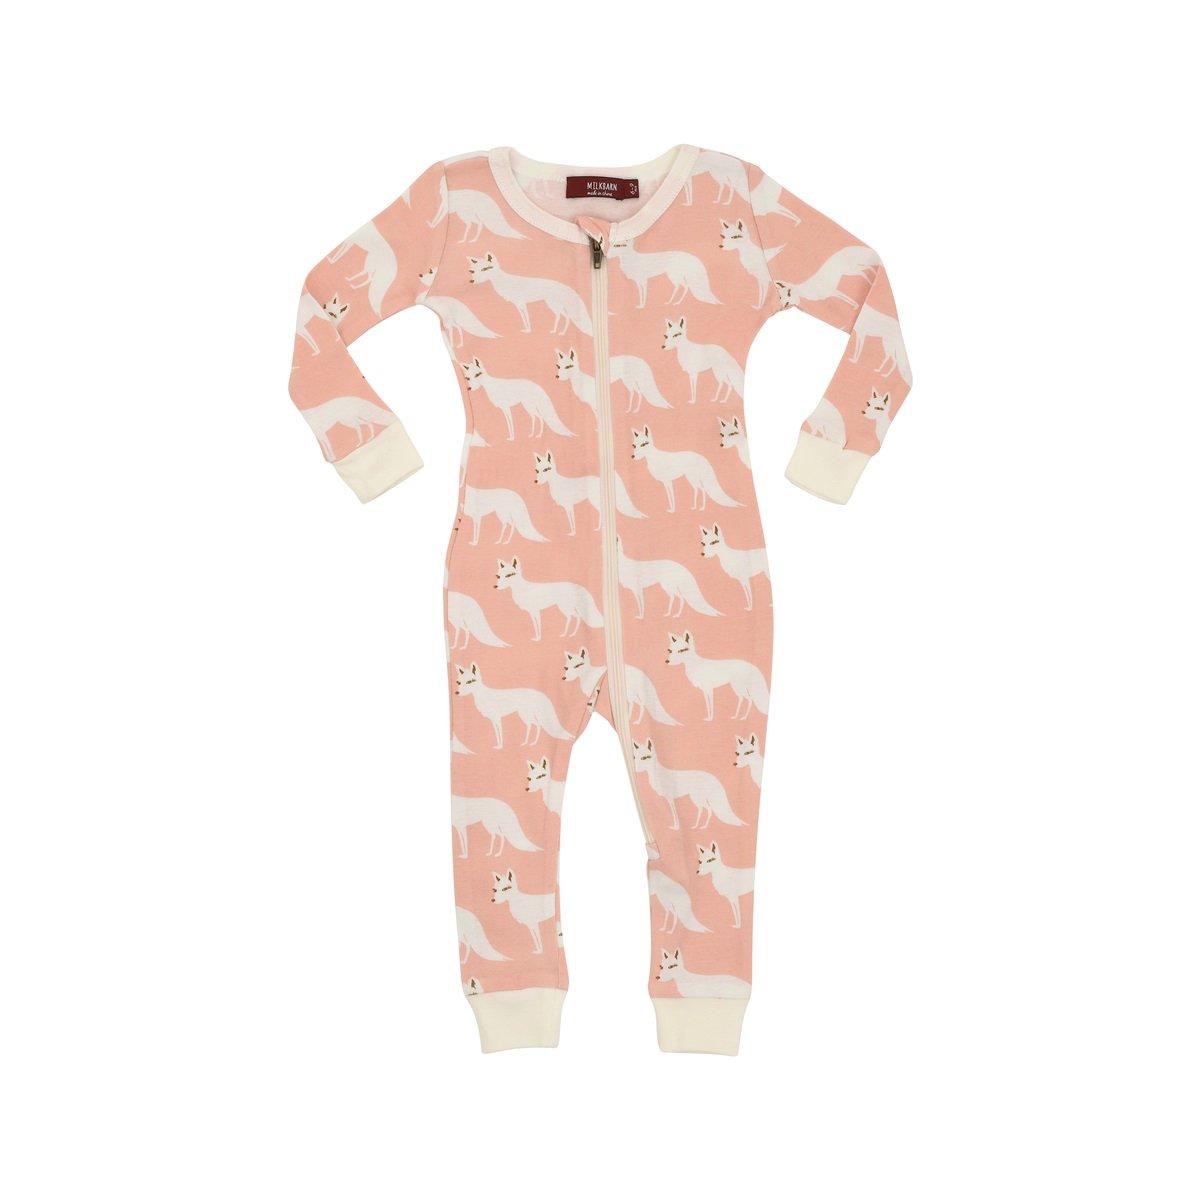 MilkBarn Organic Cotton Zipper Pajama - Pink Fox (6-9 Months) by MilkBarn